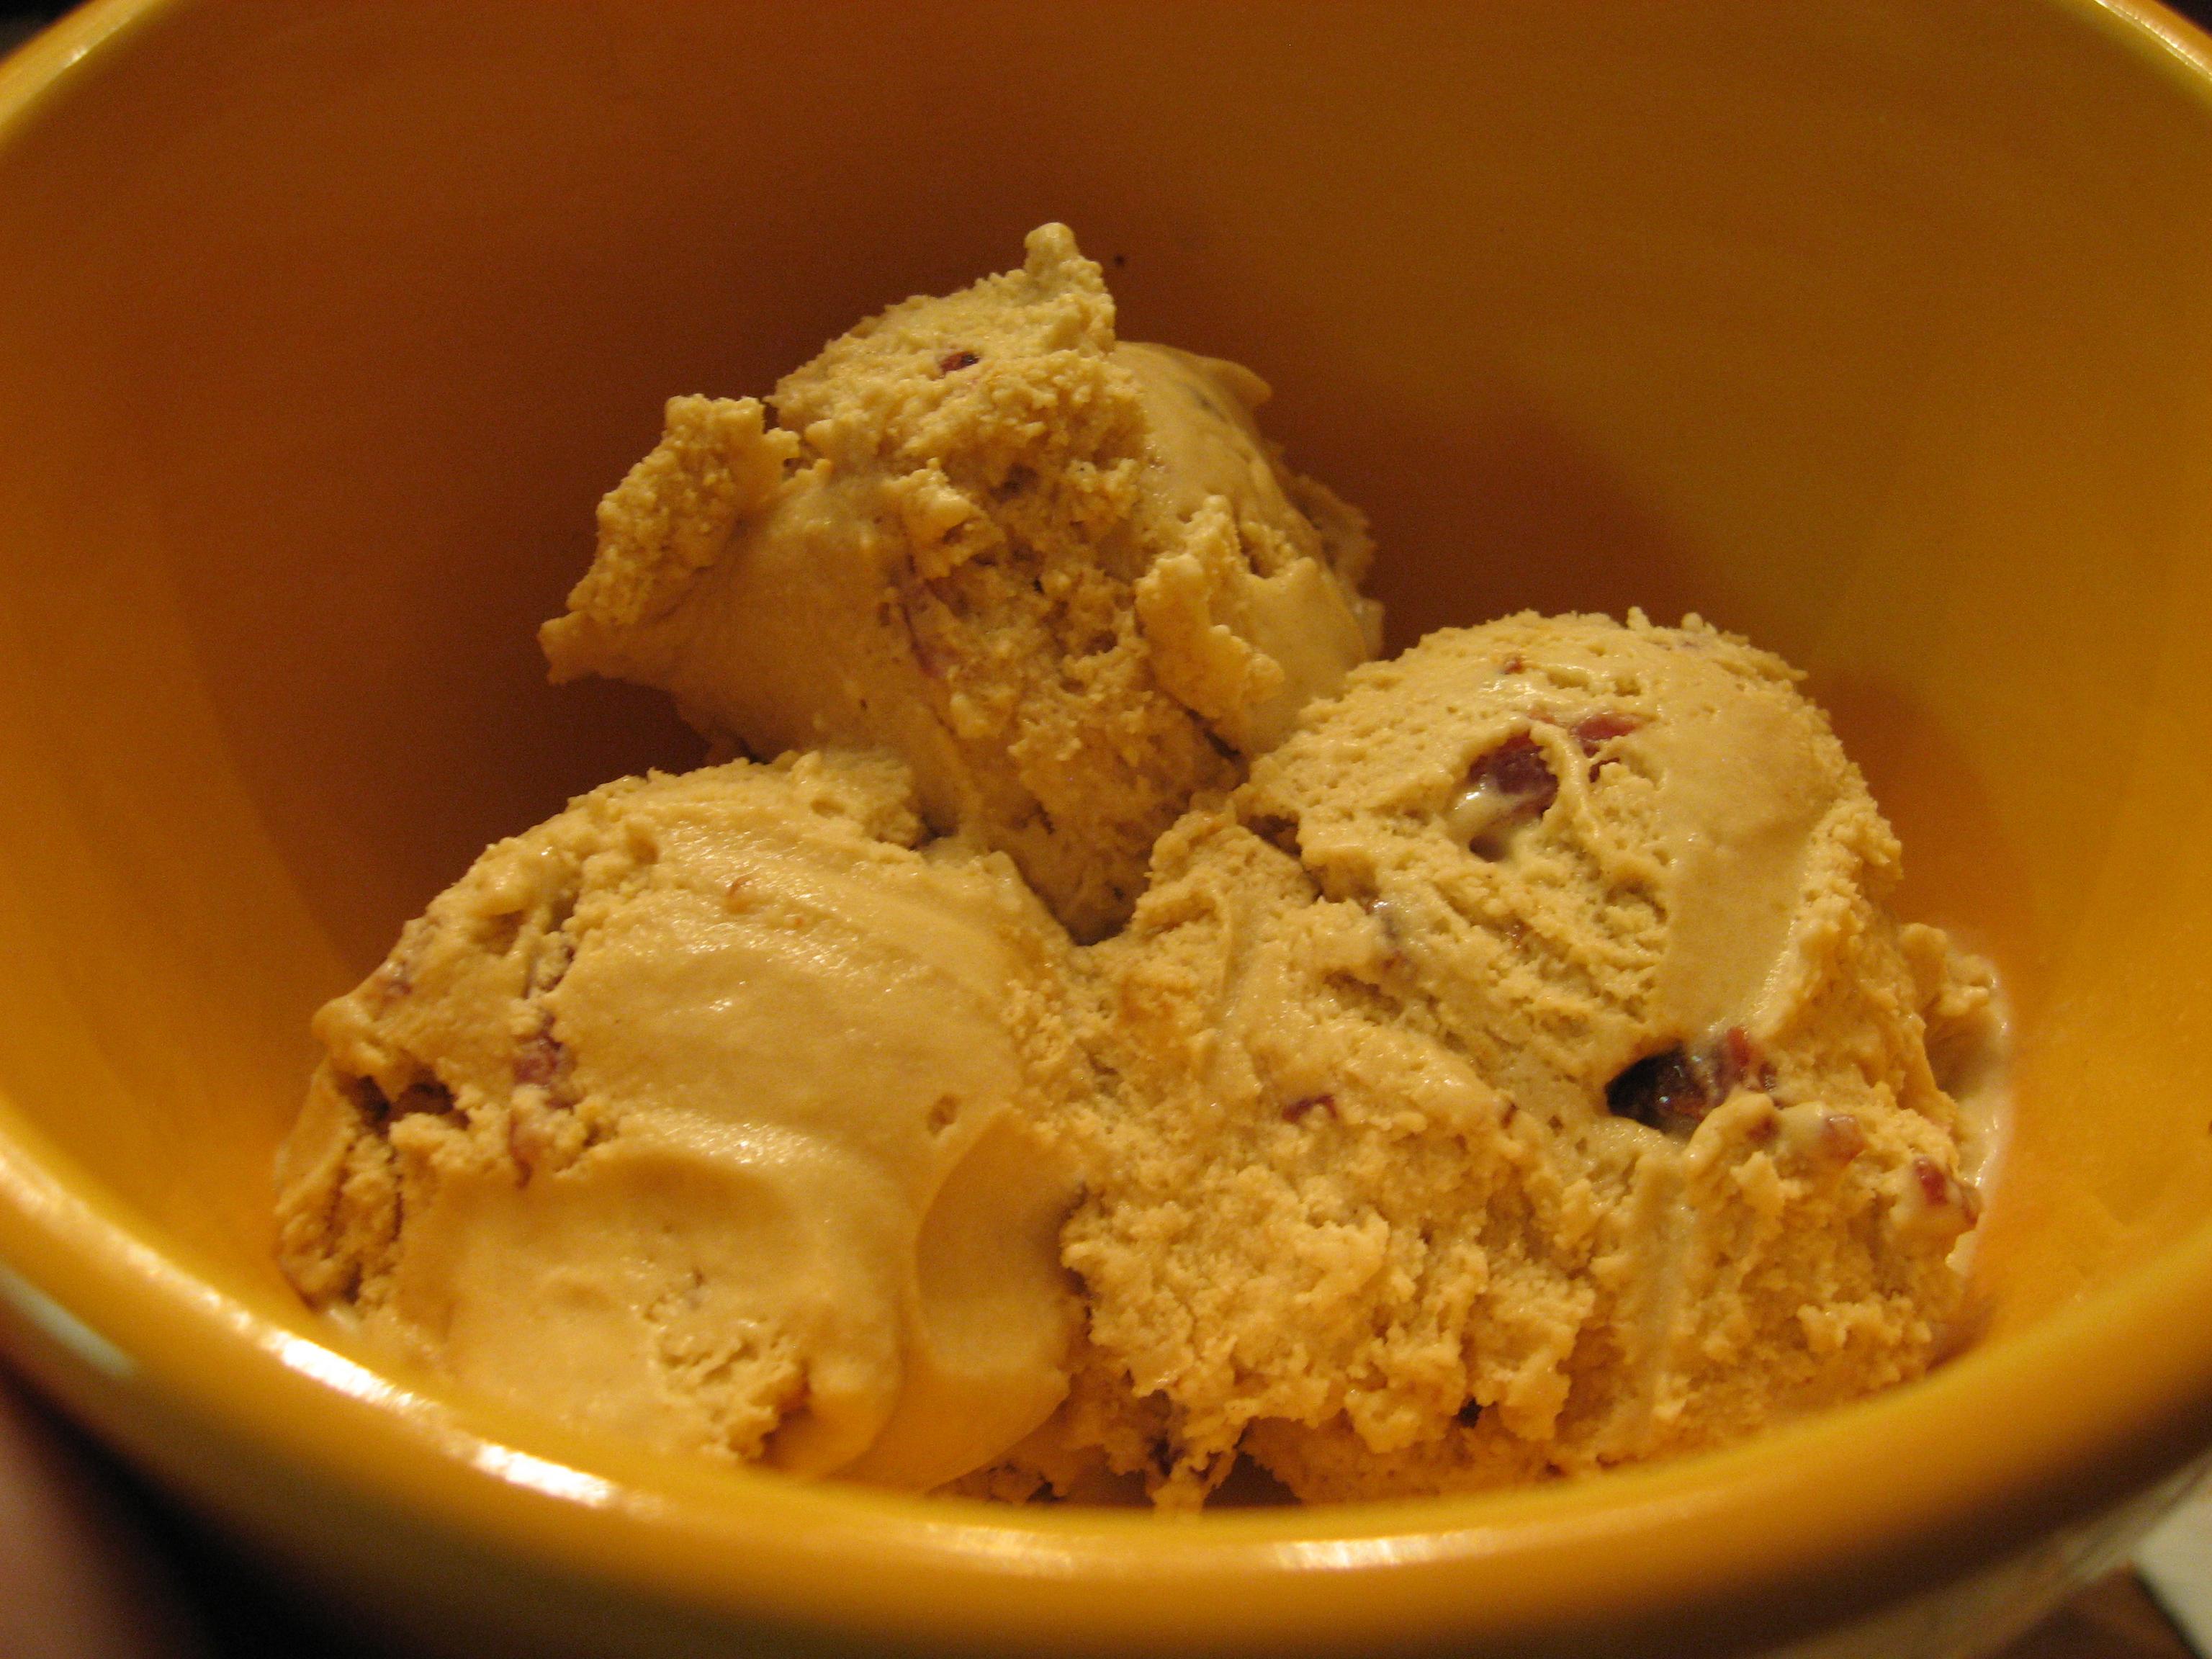 Candied Bacon Ice Cream | Explore kimberlykv's photos on Fli ...